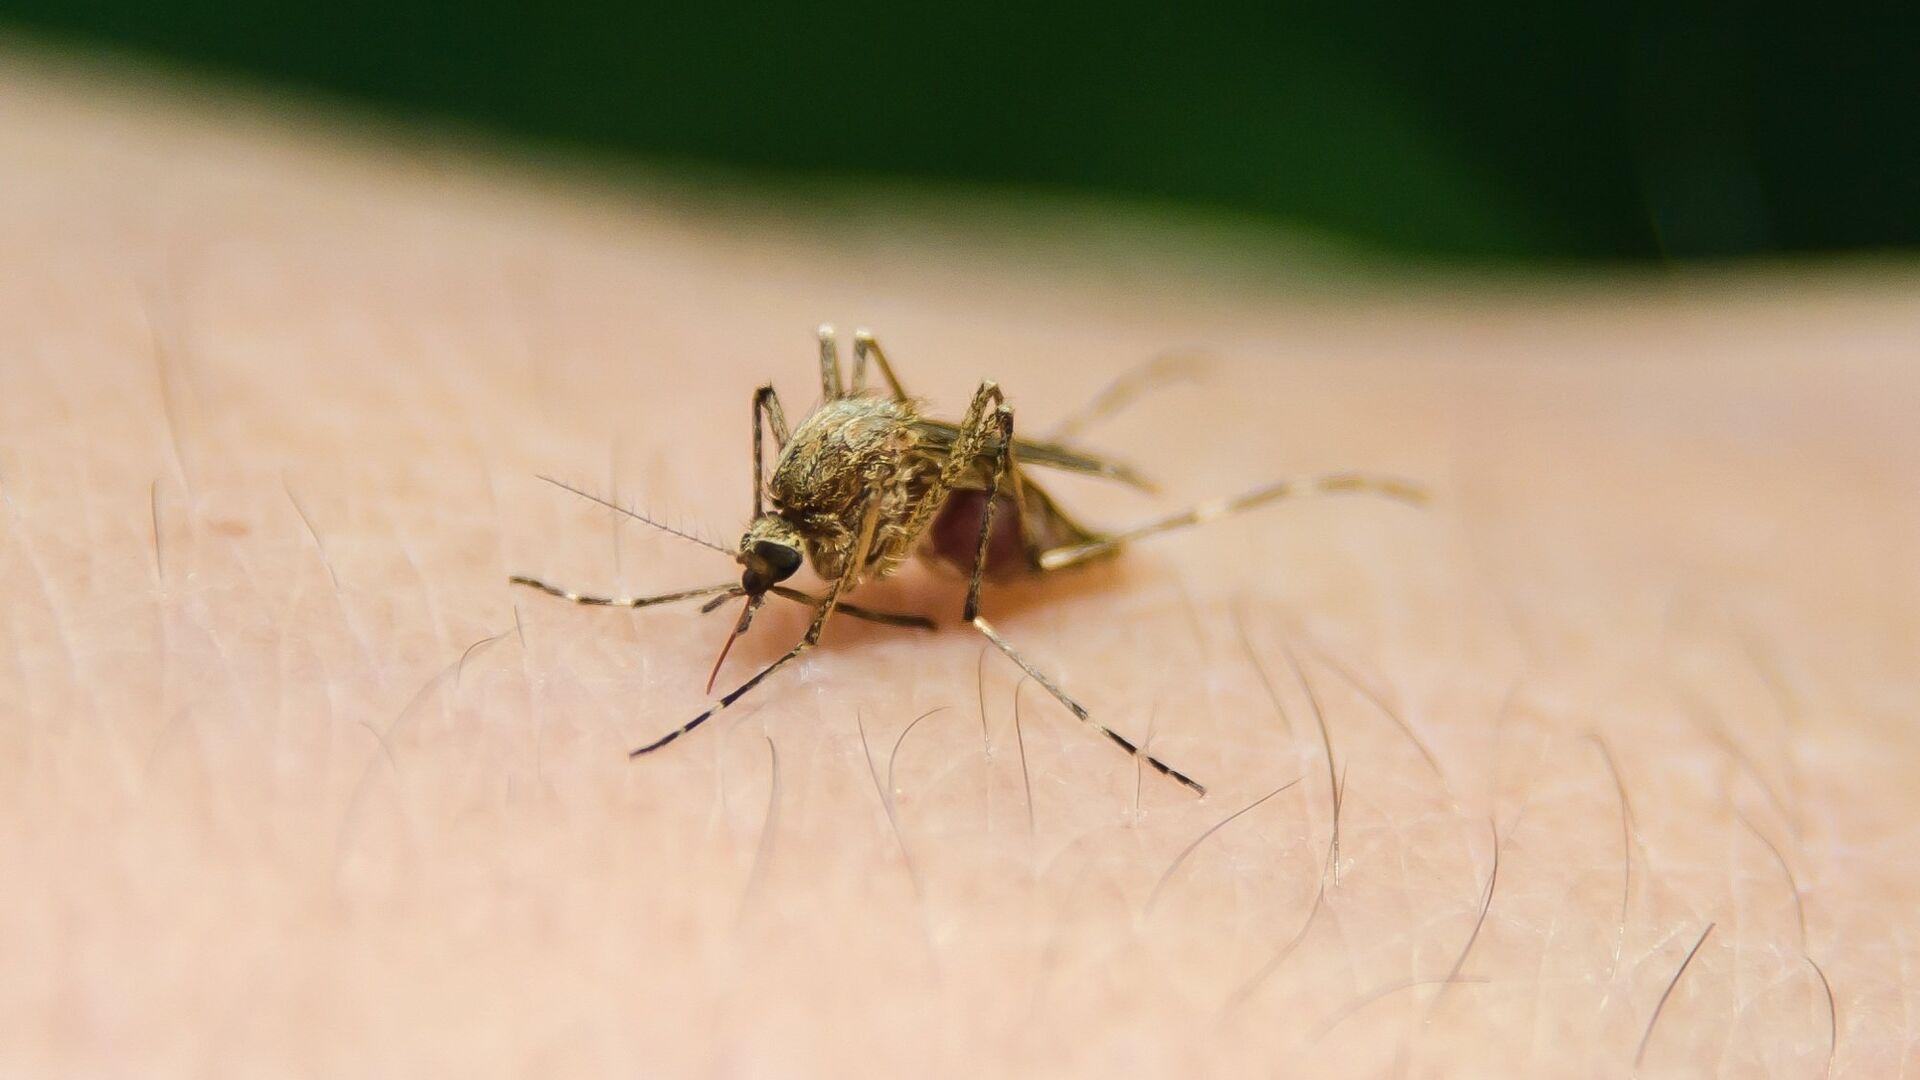 Un mosquito - Sputnik Mundo, 1920, 19.02.2021